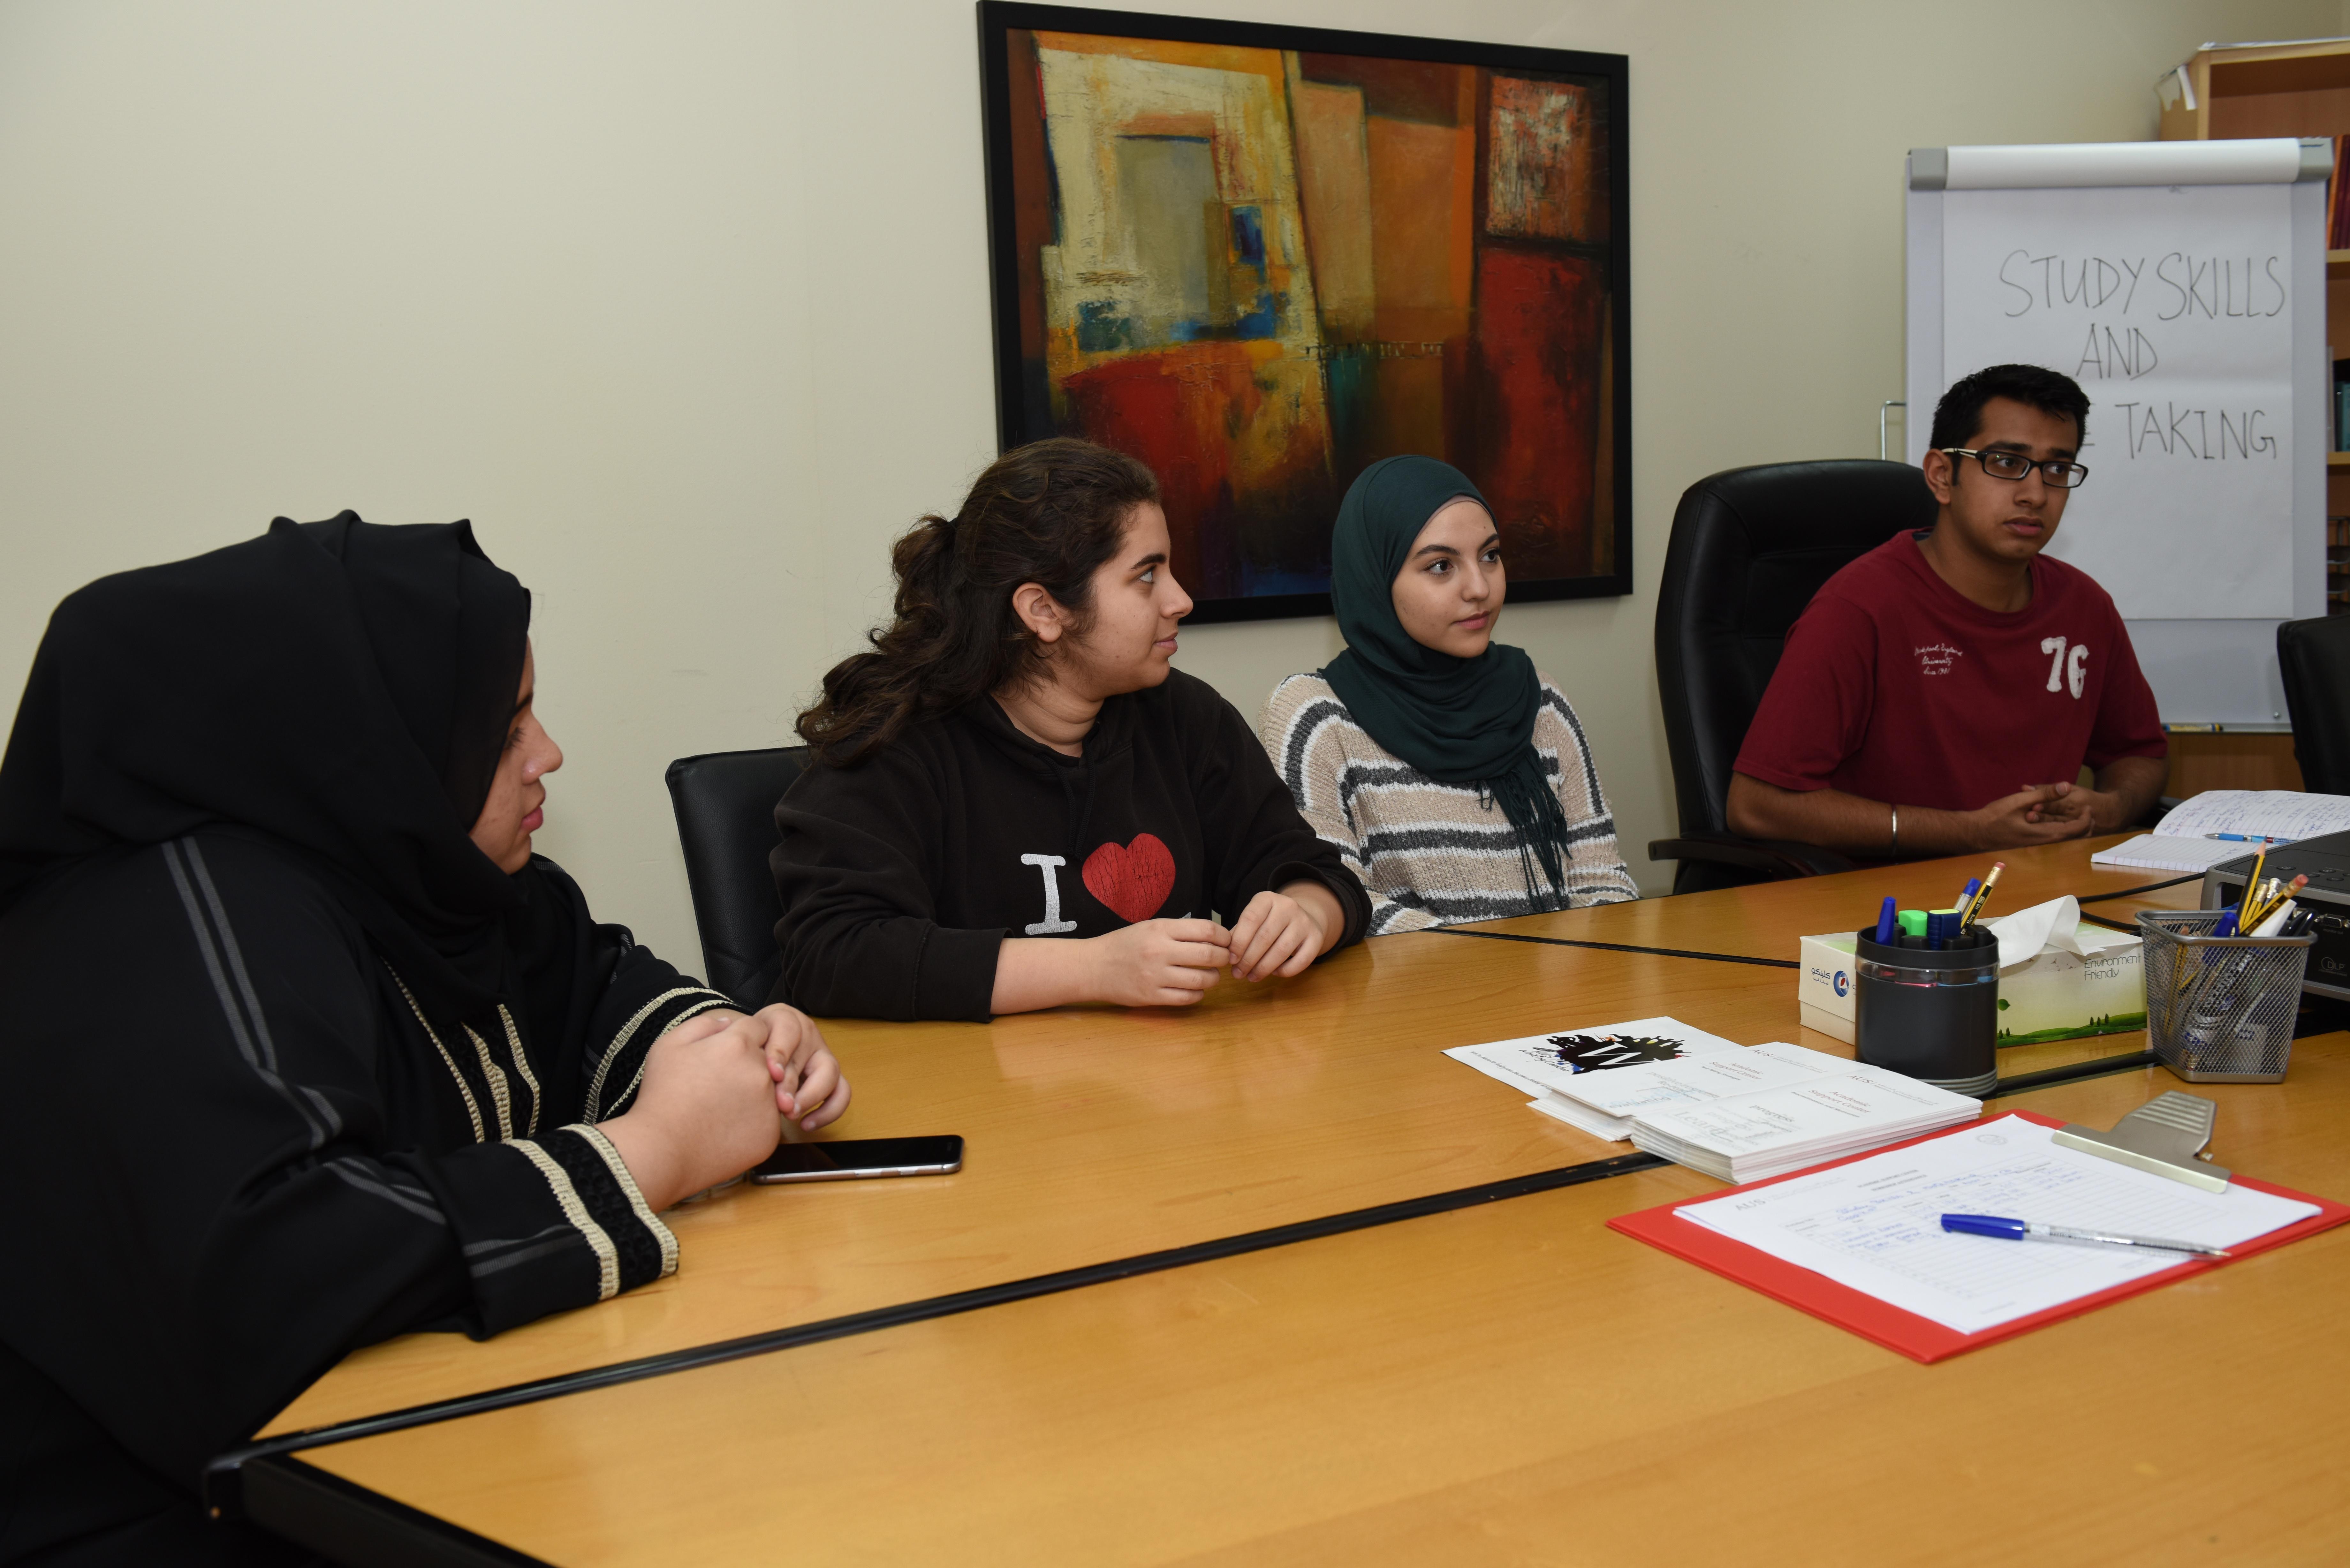 American_University_of_Sharjah_5-1.jpg